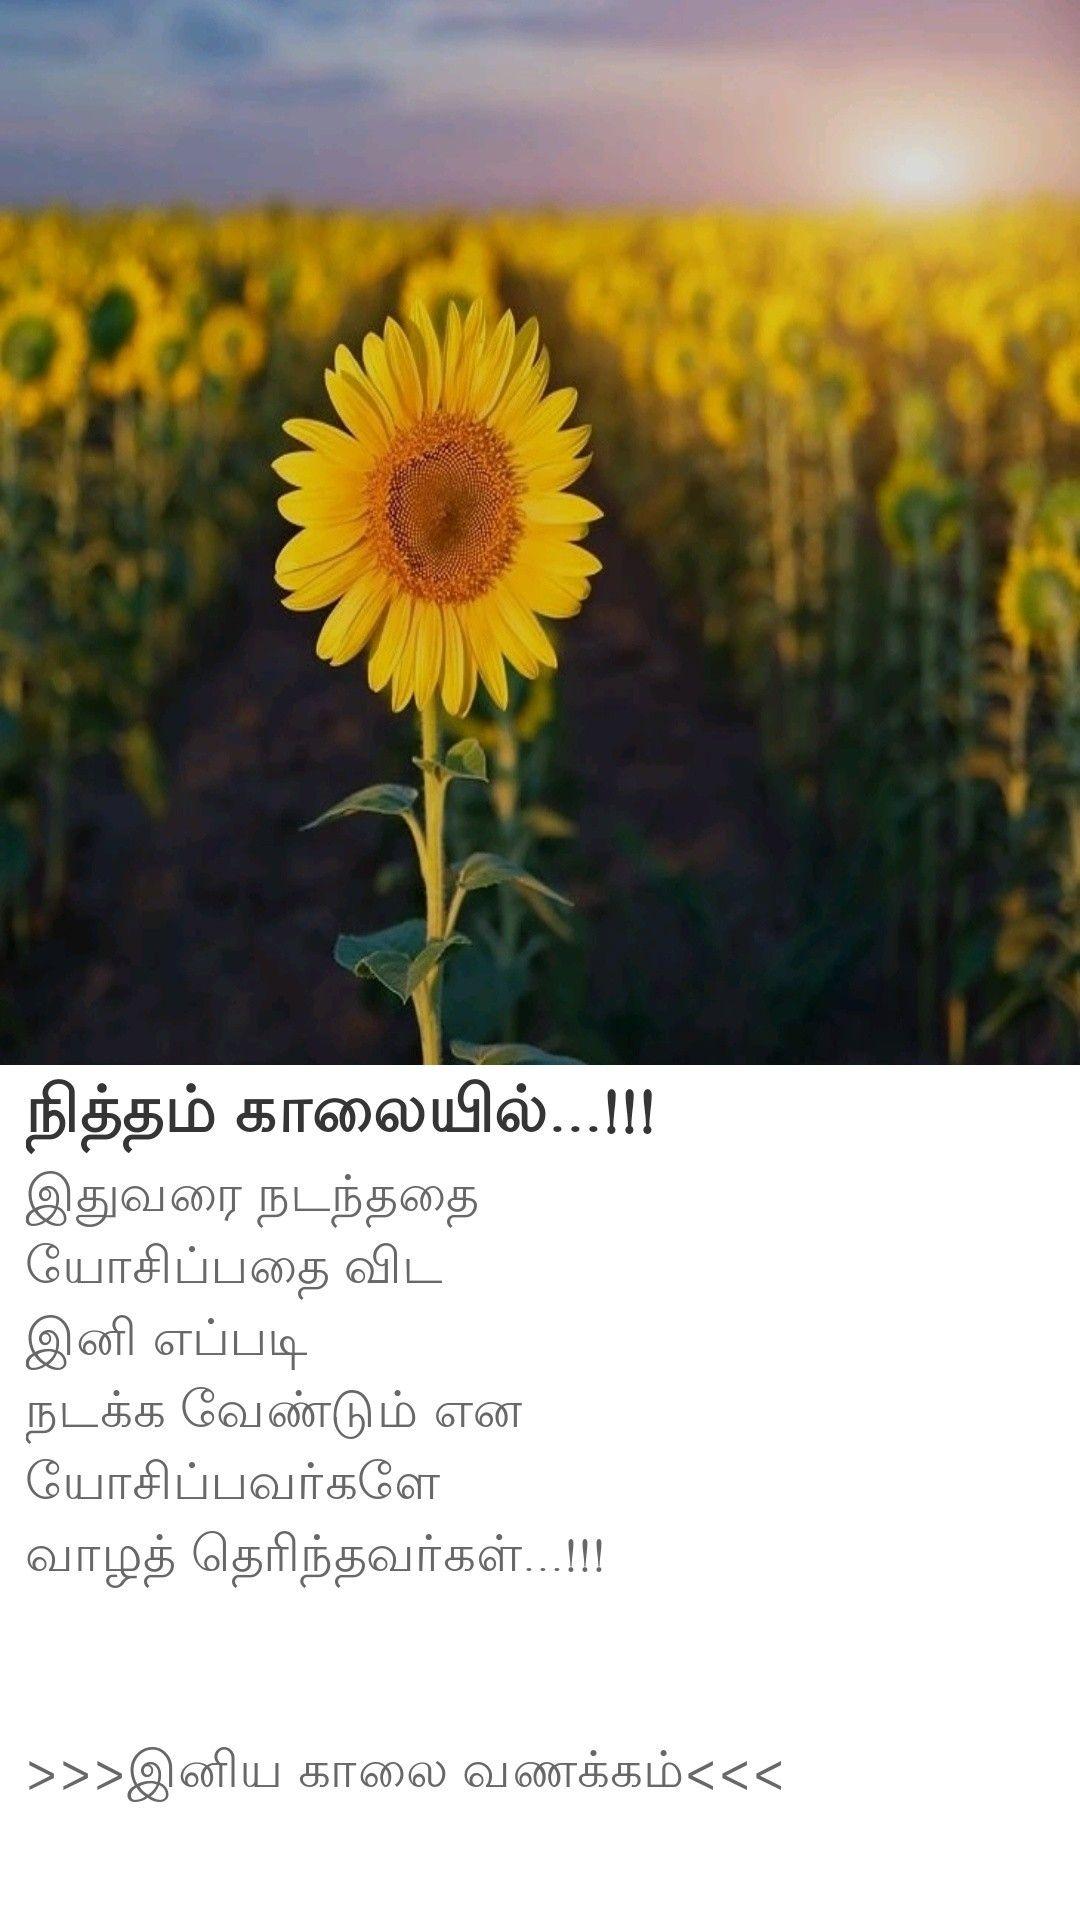 Pin By Ezhilchezhiyan On Wishes In 2020 Plants Flowers Dandelion